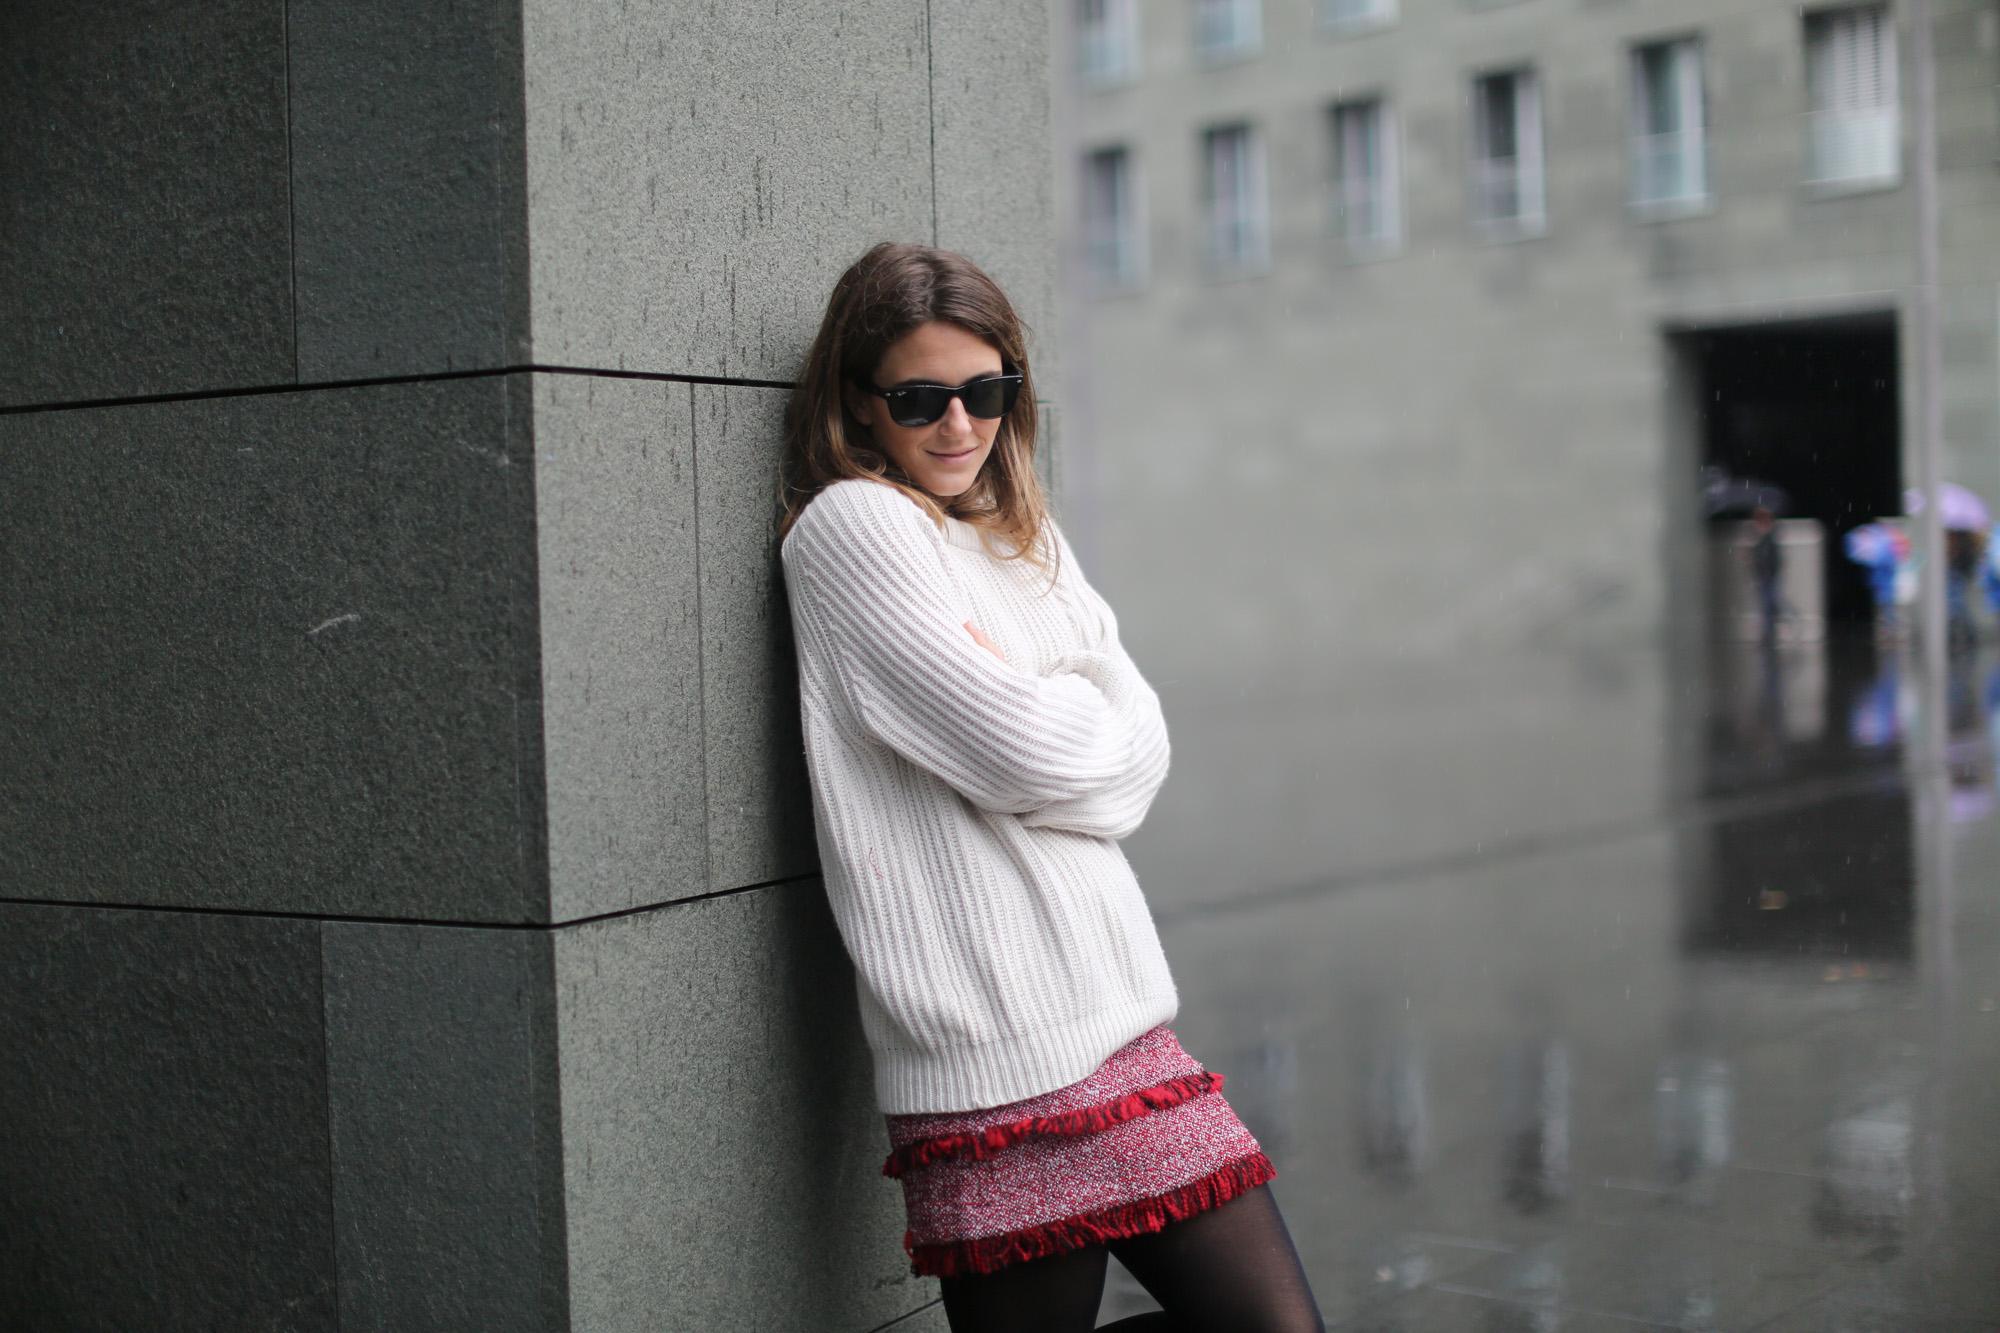 Clochet-streetstyle-mango-tweed-mini-skirt-chunky-knit-lykke-ly-loafers-3